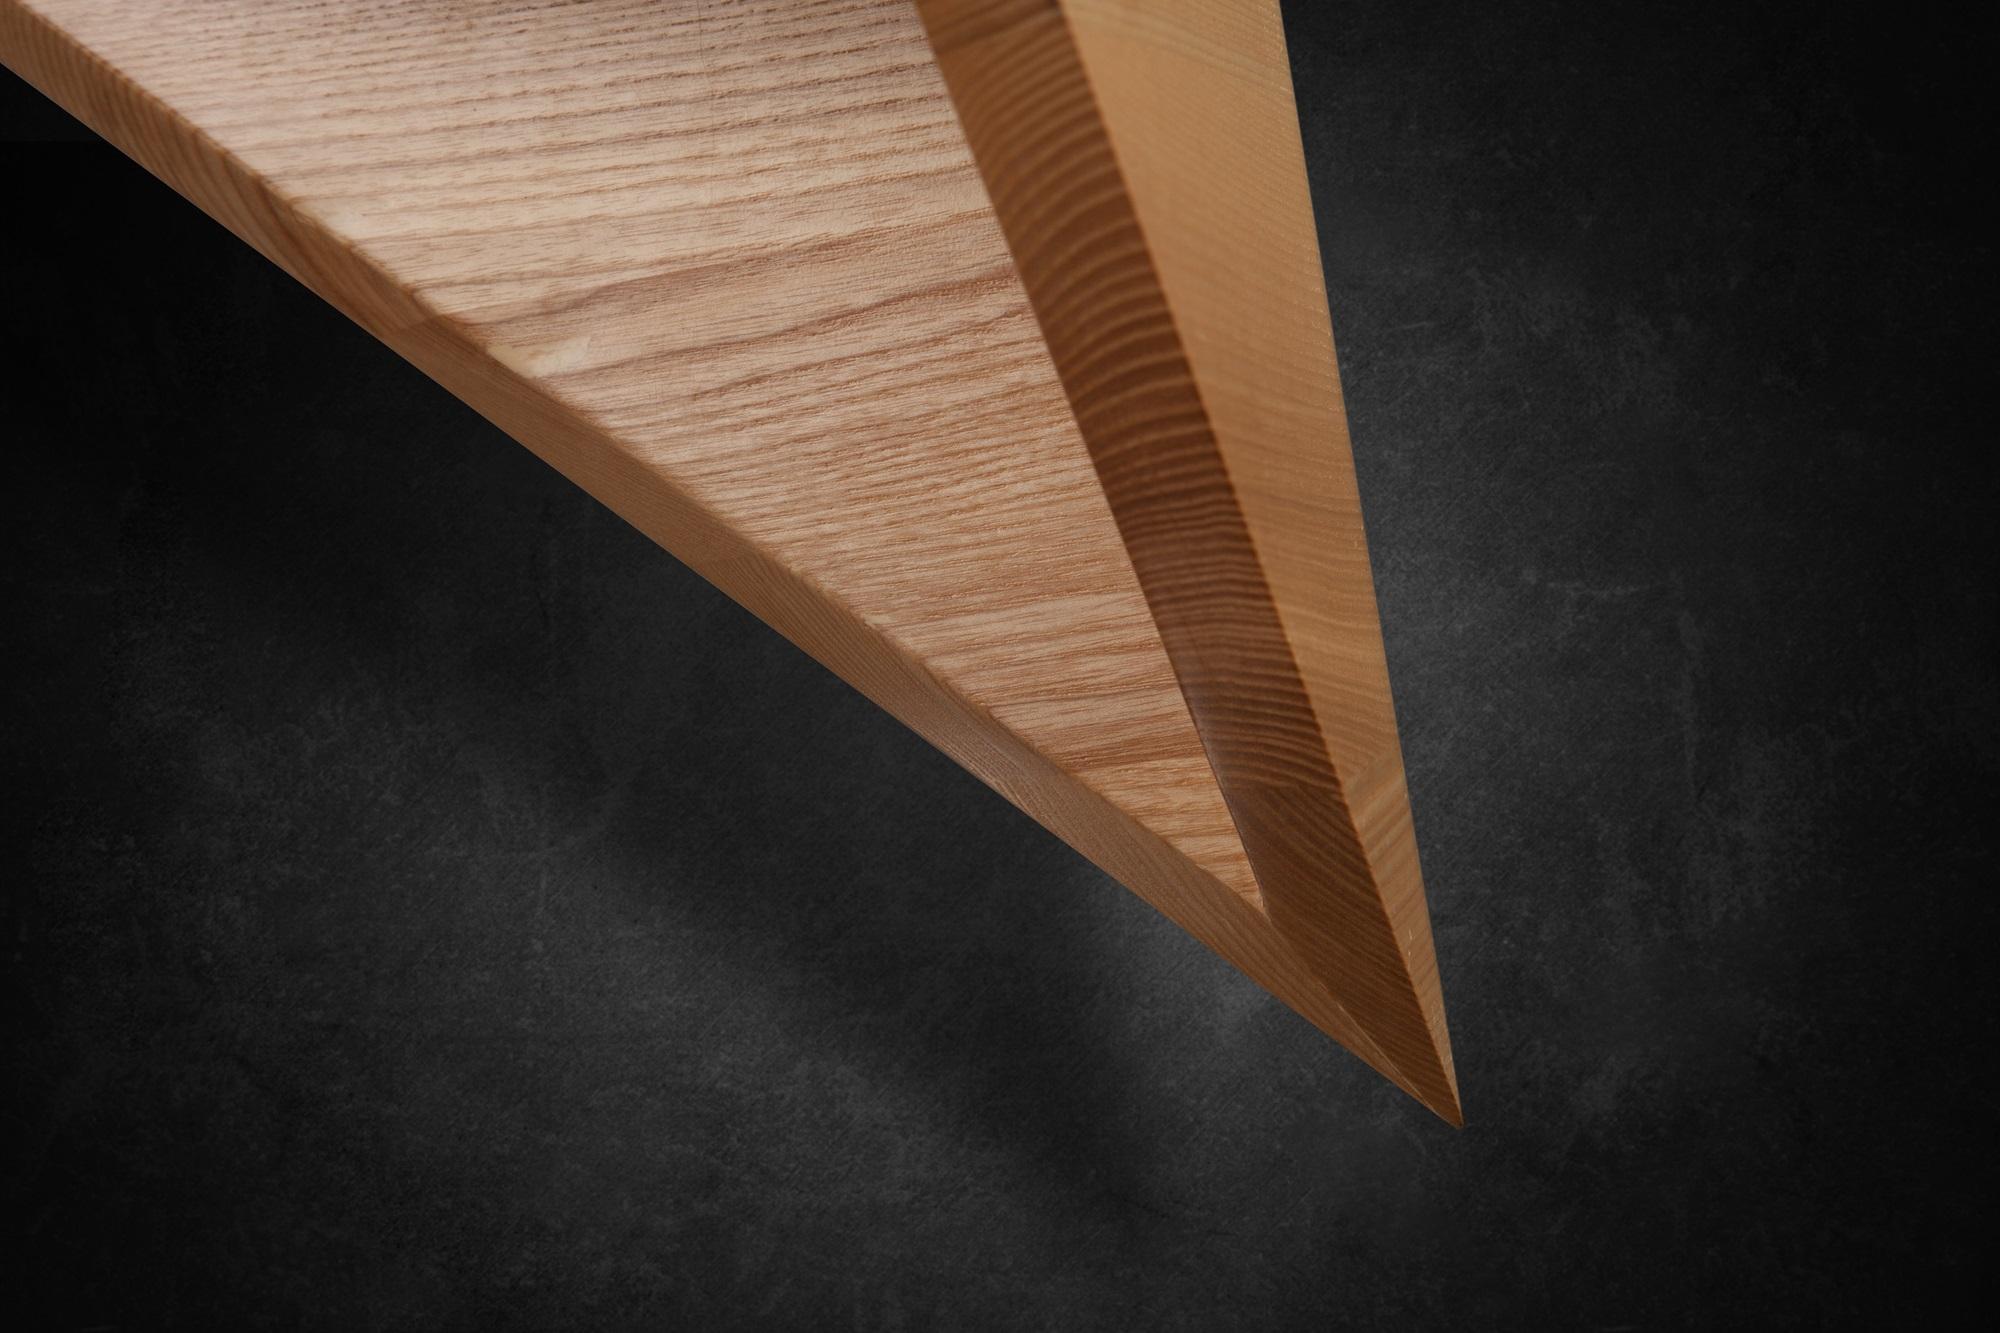 skeld-design-sharp-ash-03.jpg